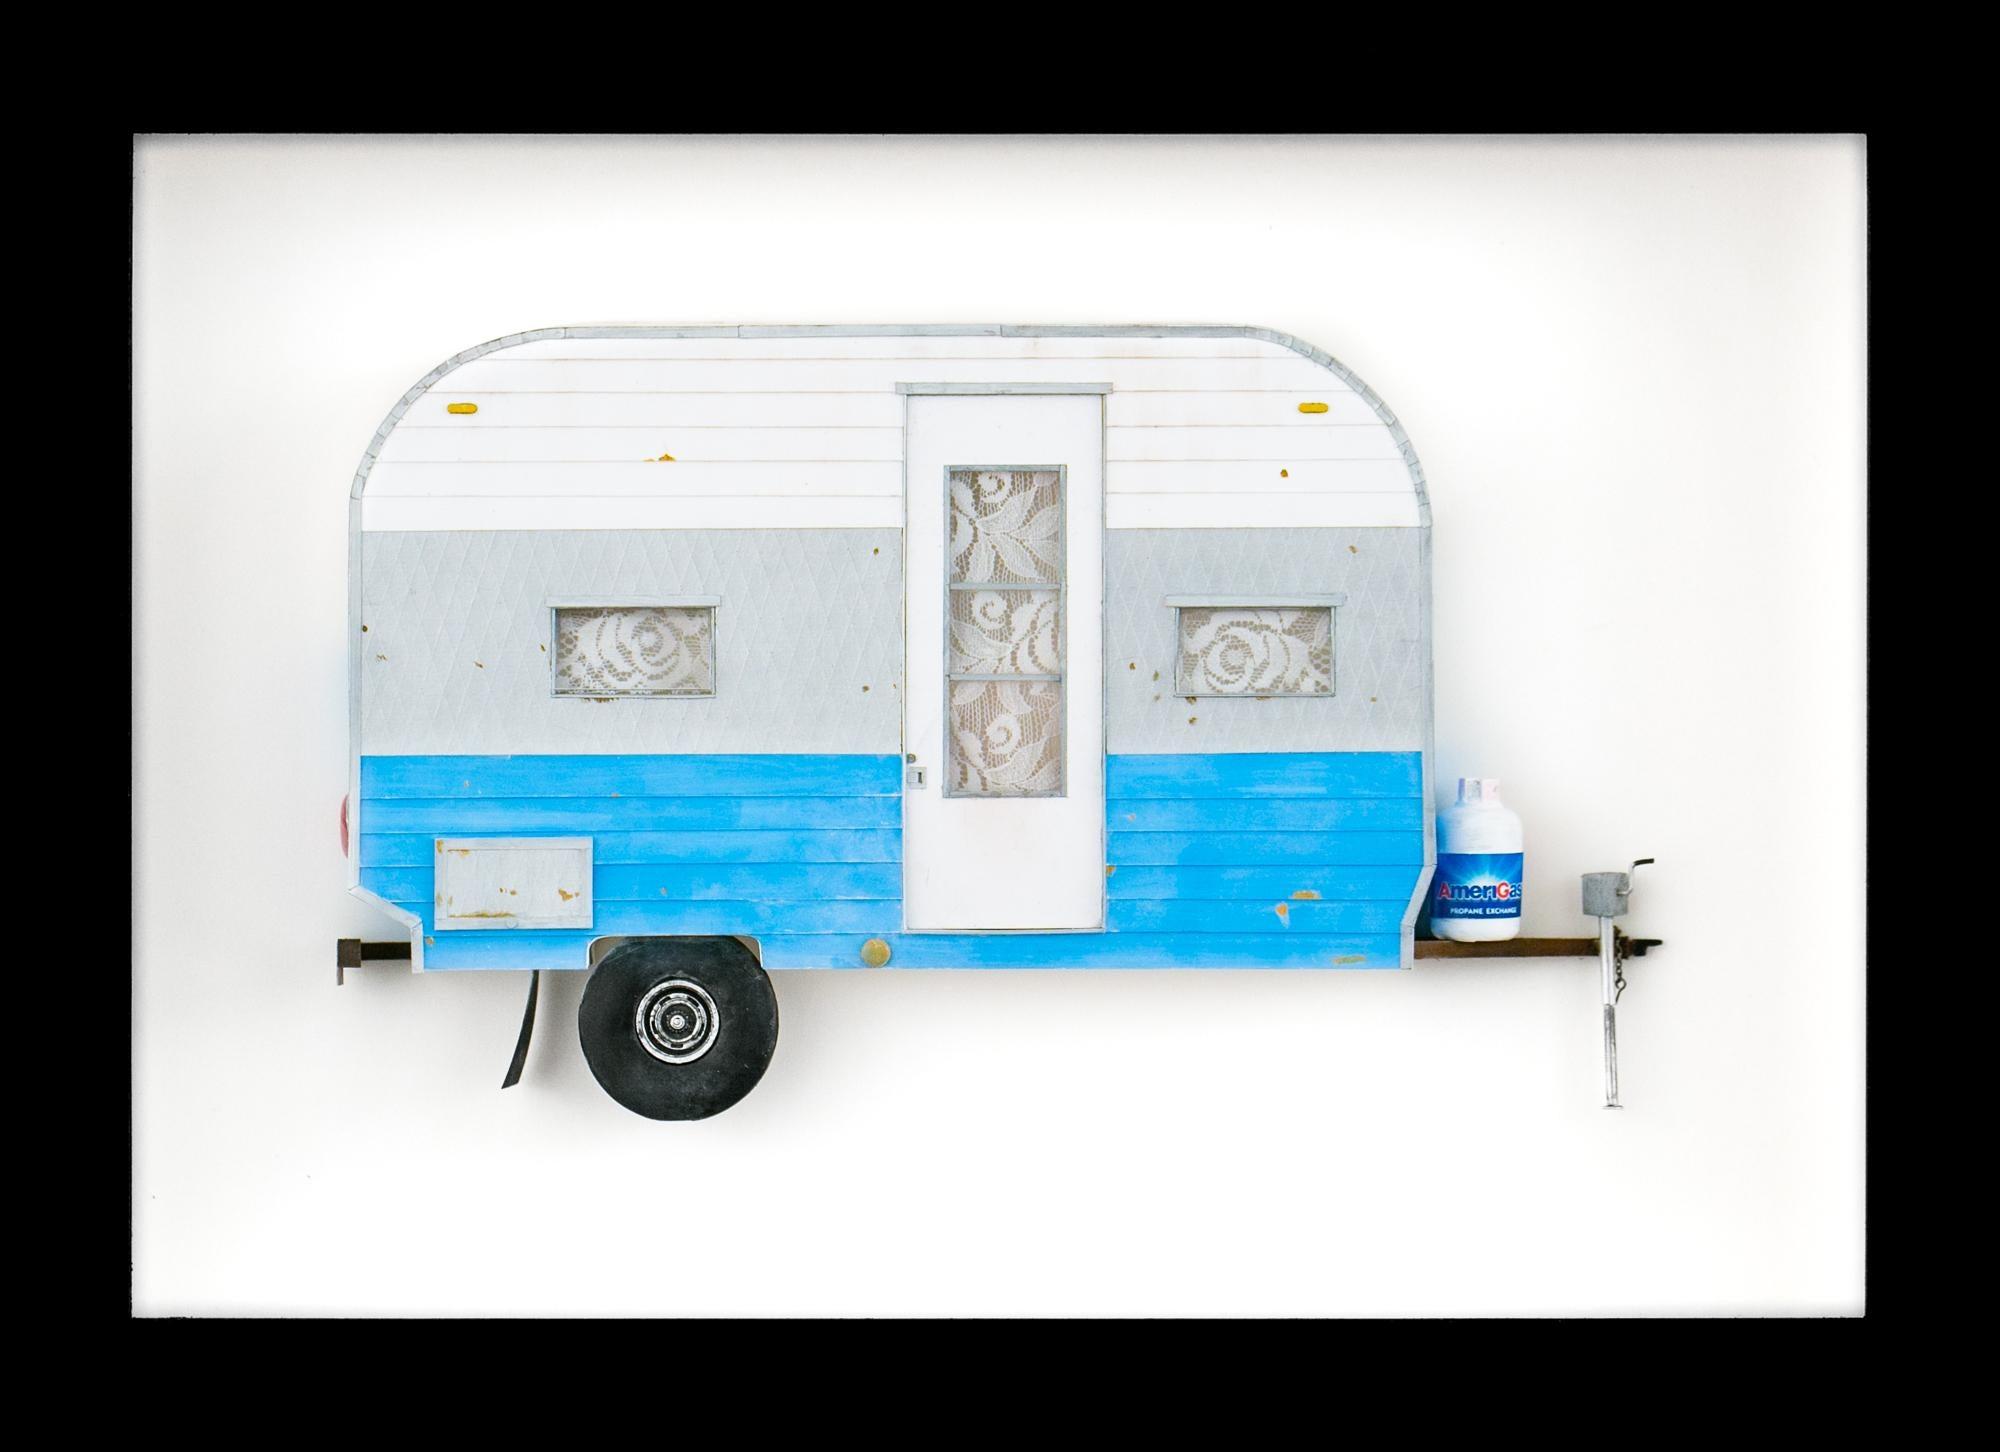 """PUPPIES"", Miniature, camping trailer van, paper sculpture, blue, grey, white"